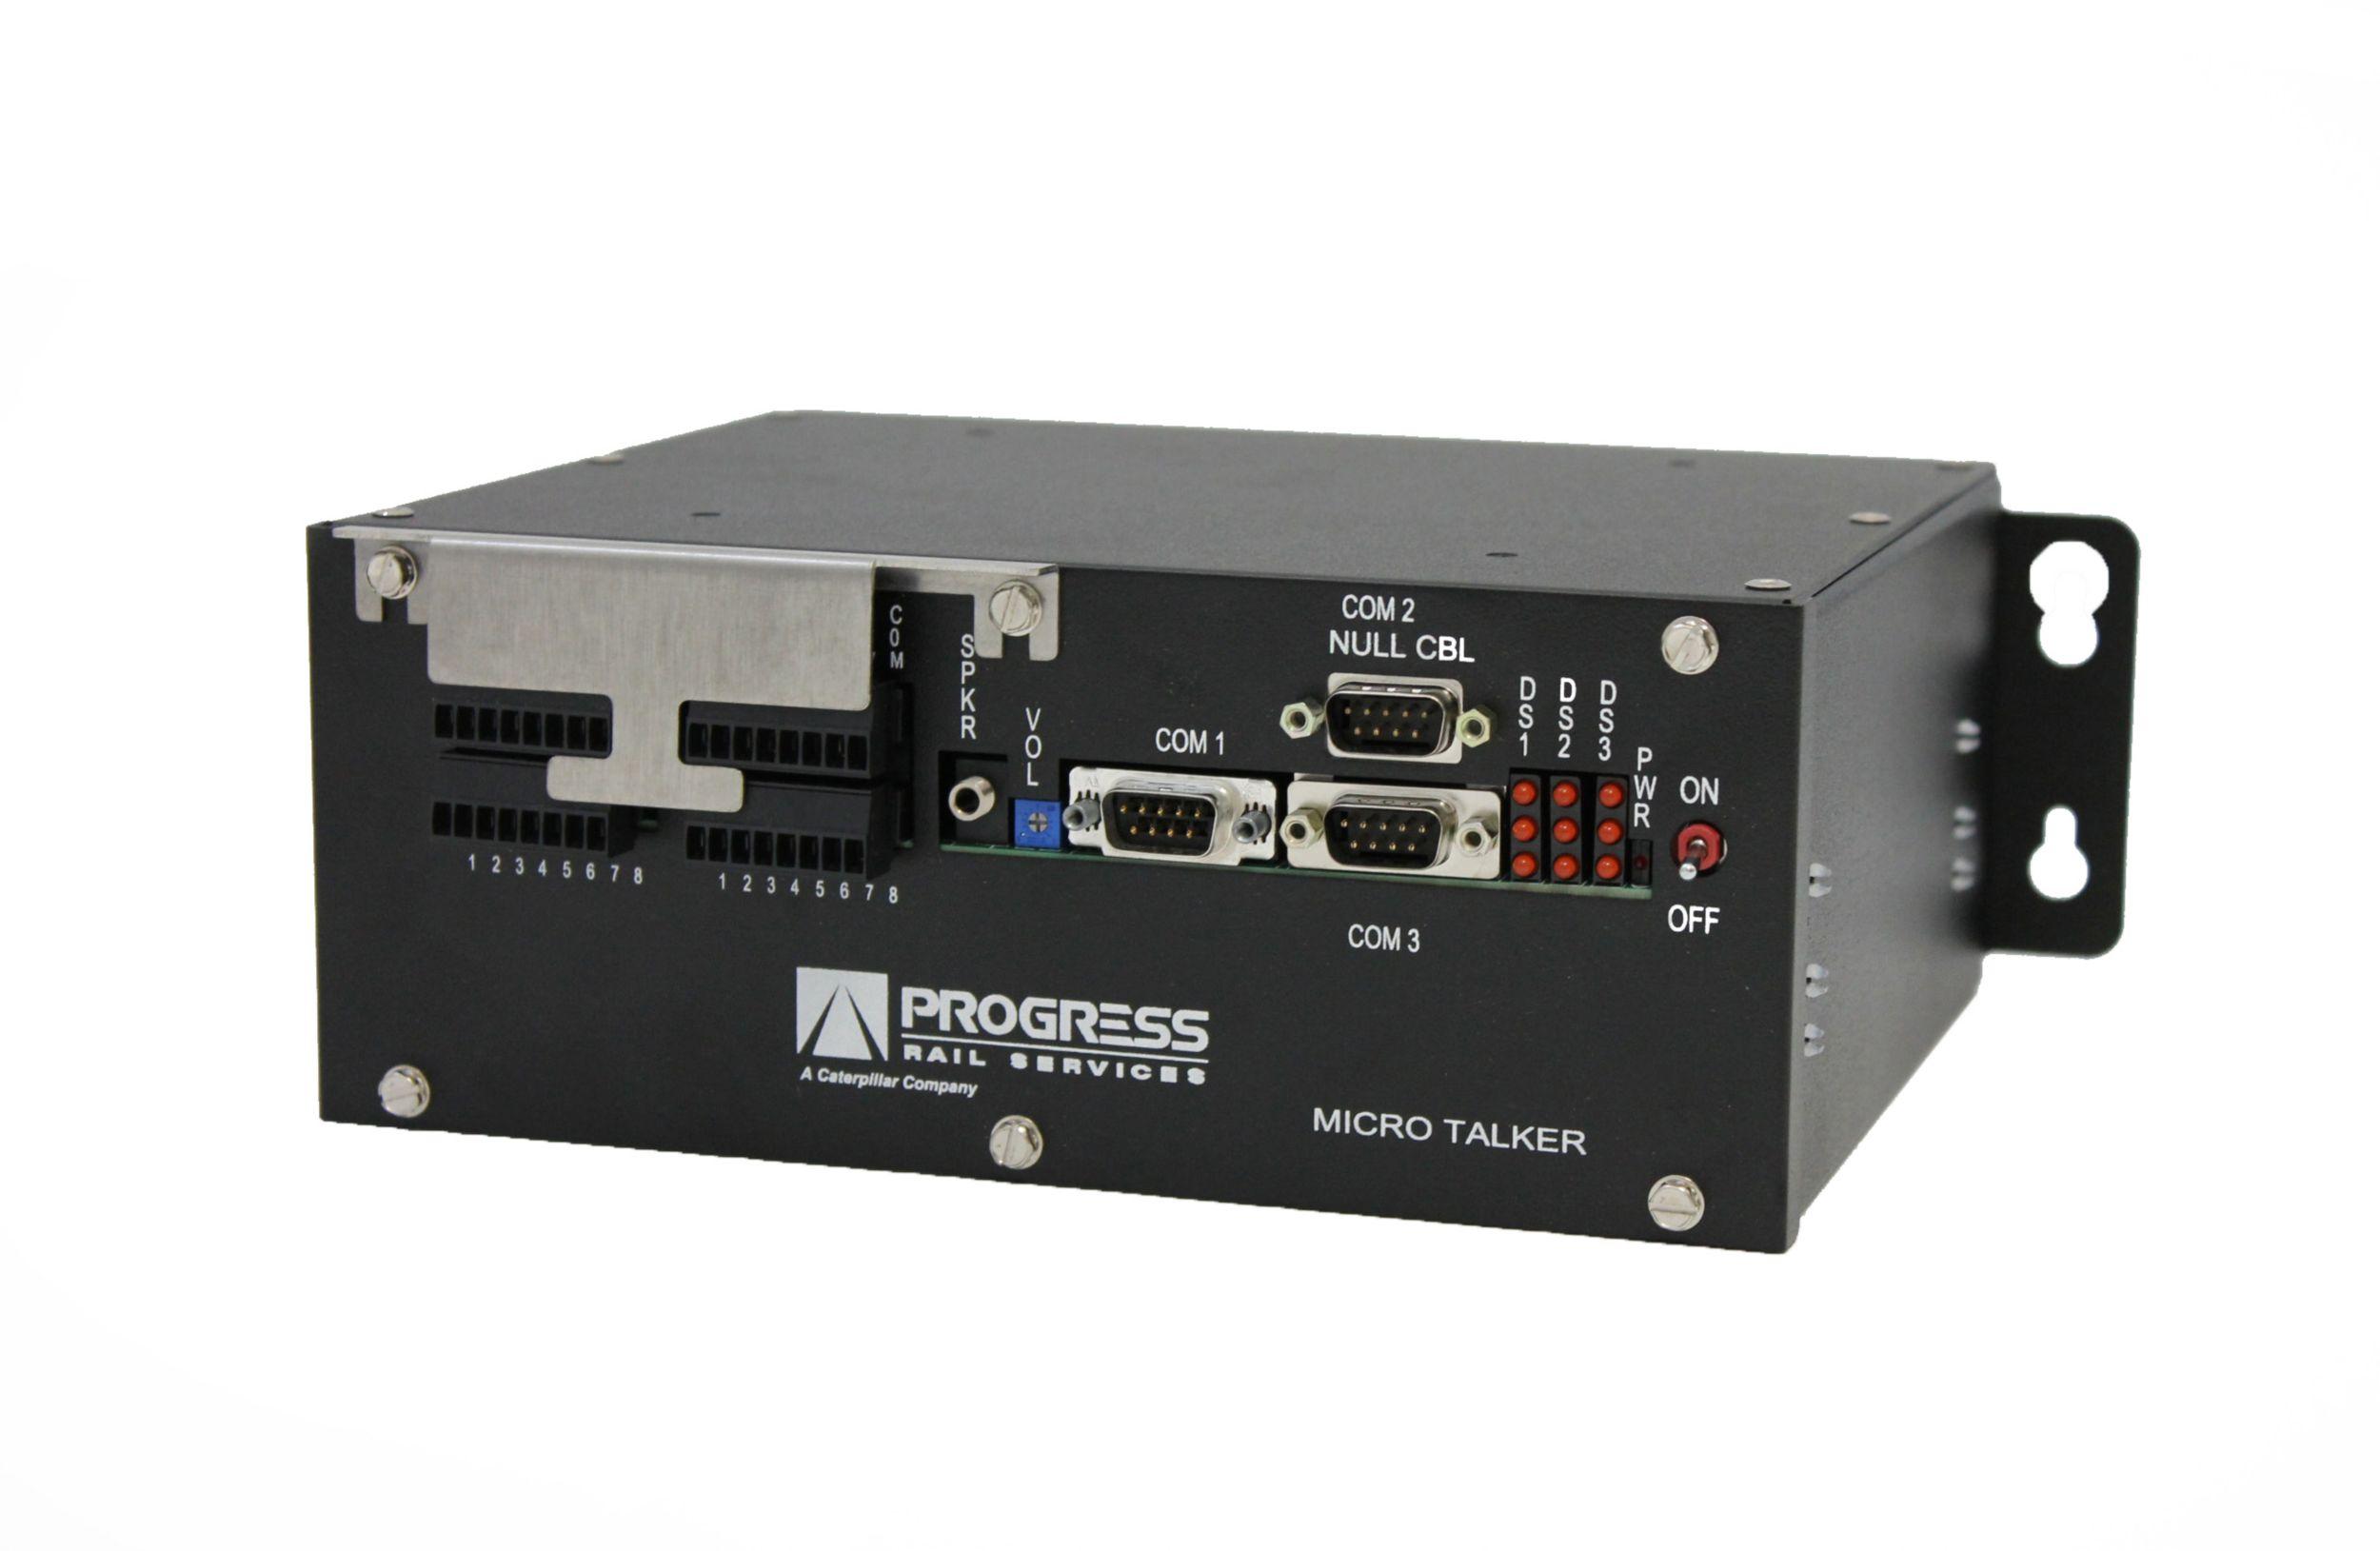 Progress Rail Signaling